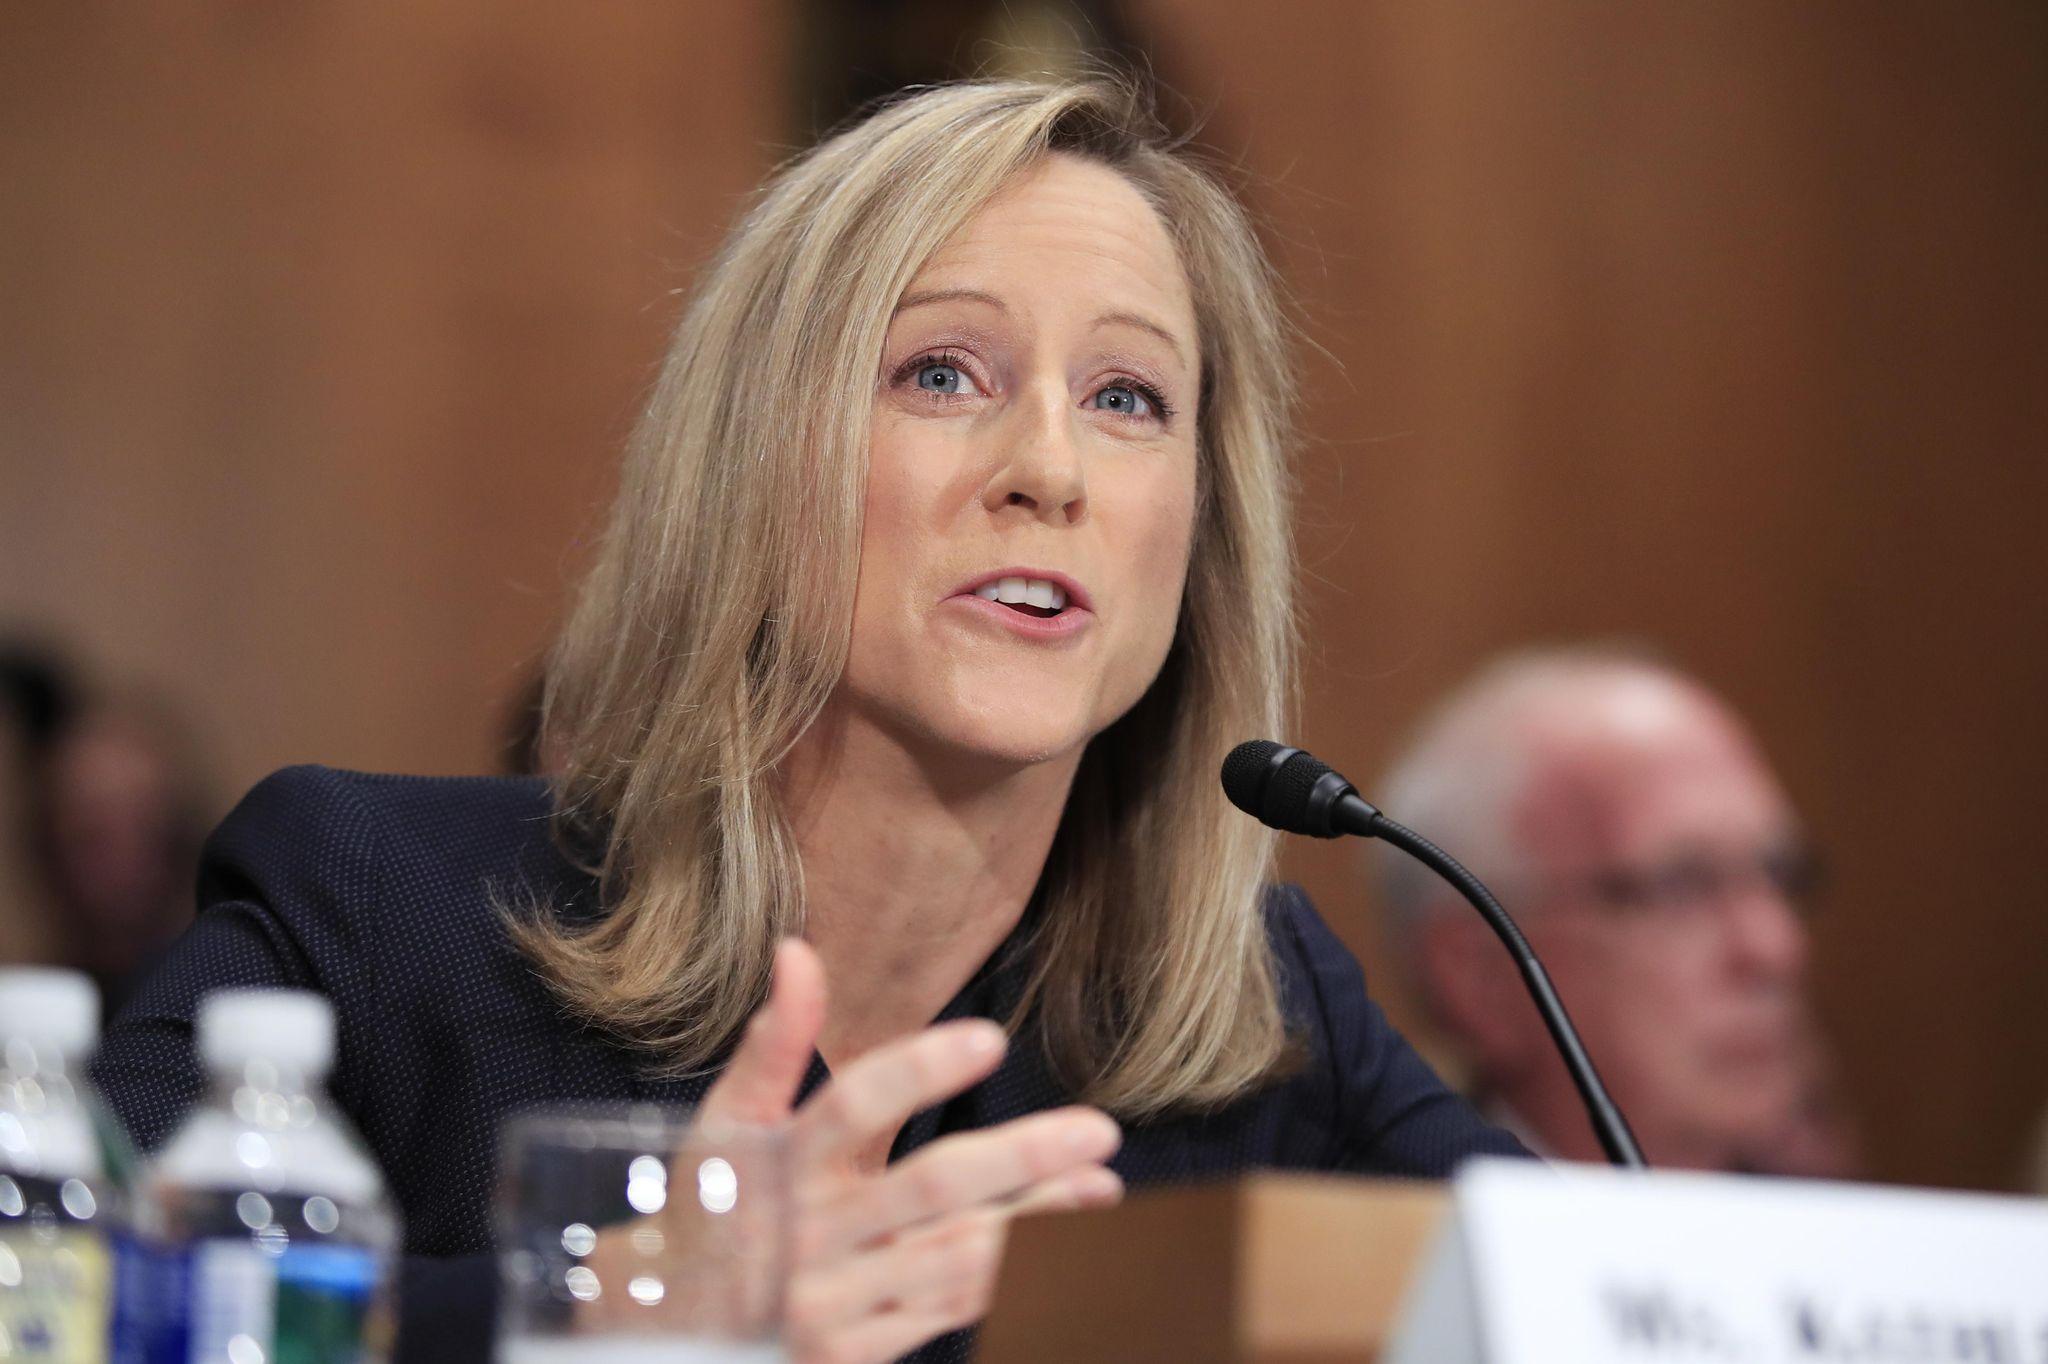 Free-market group calls on Senate to confirm Kathleen Kraninger to lead consumer bureau